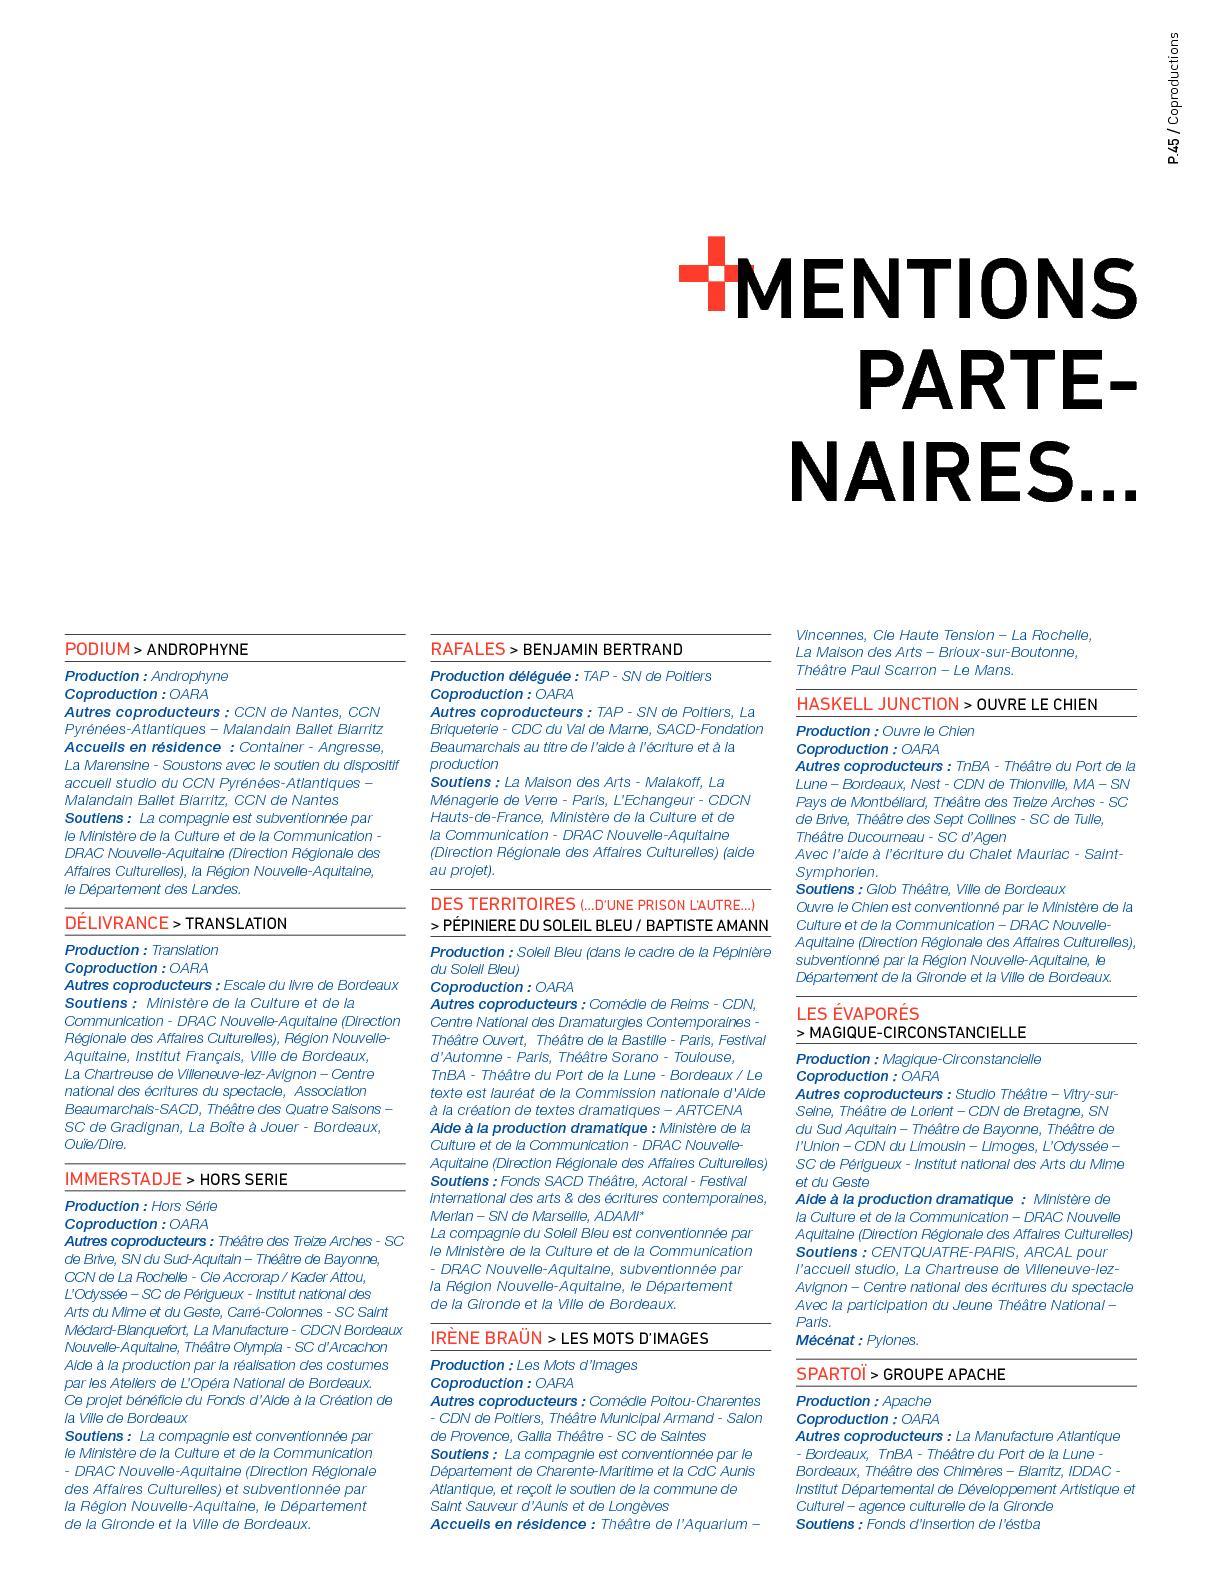 Salon De Jardin Nantes Frais Saison 2017 18 Calameo Downloader